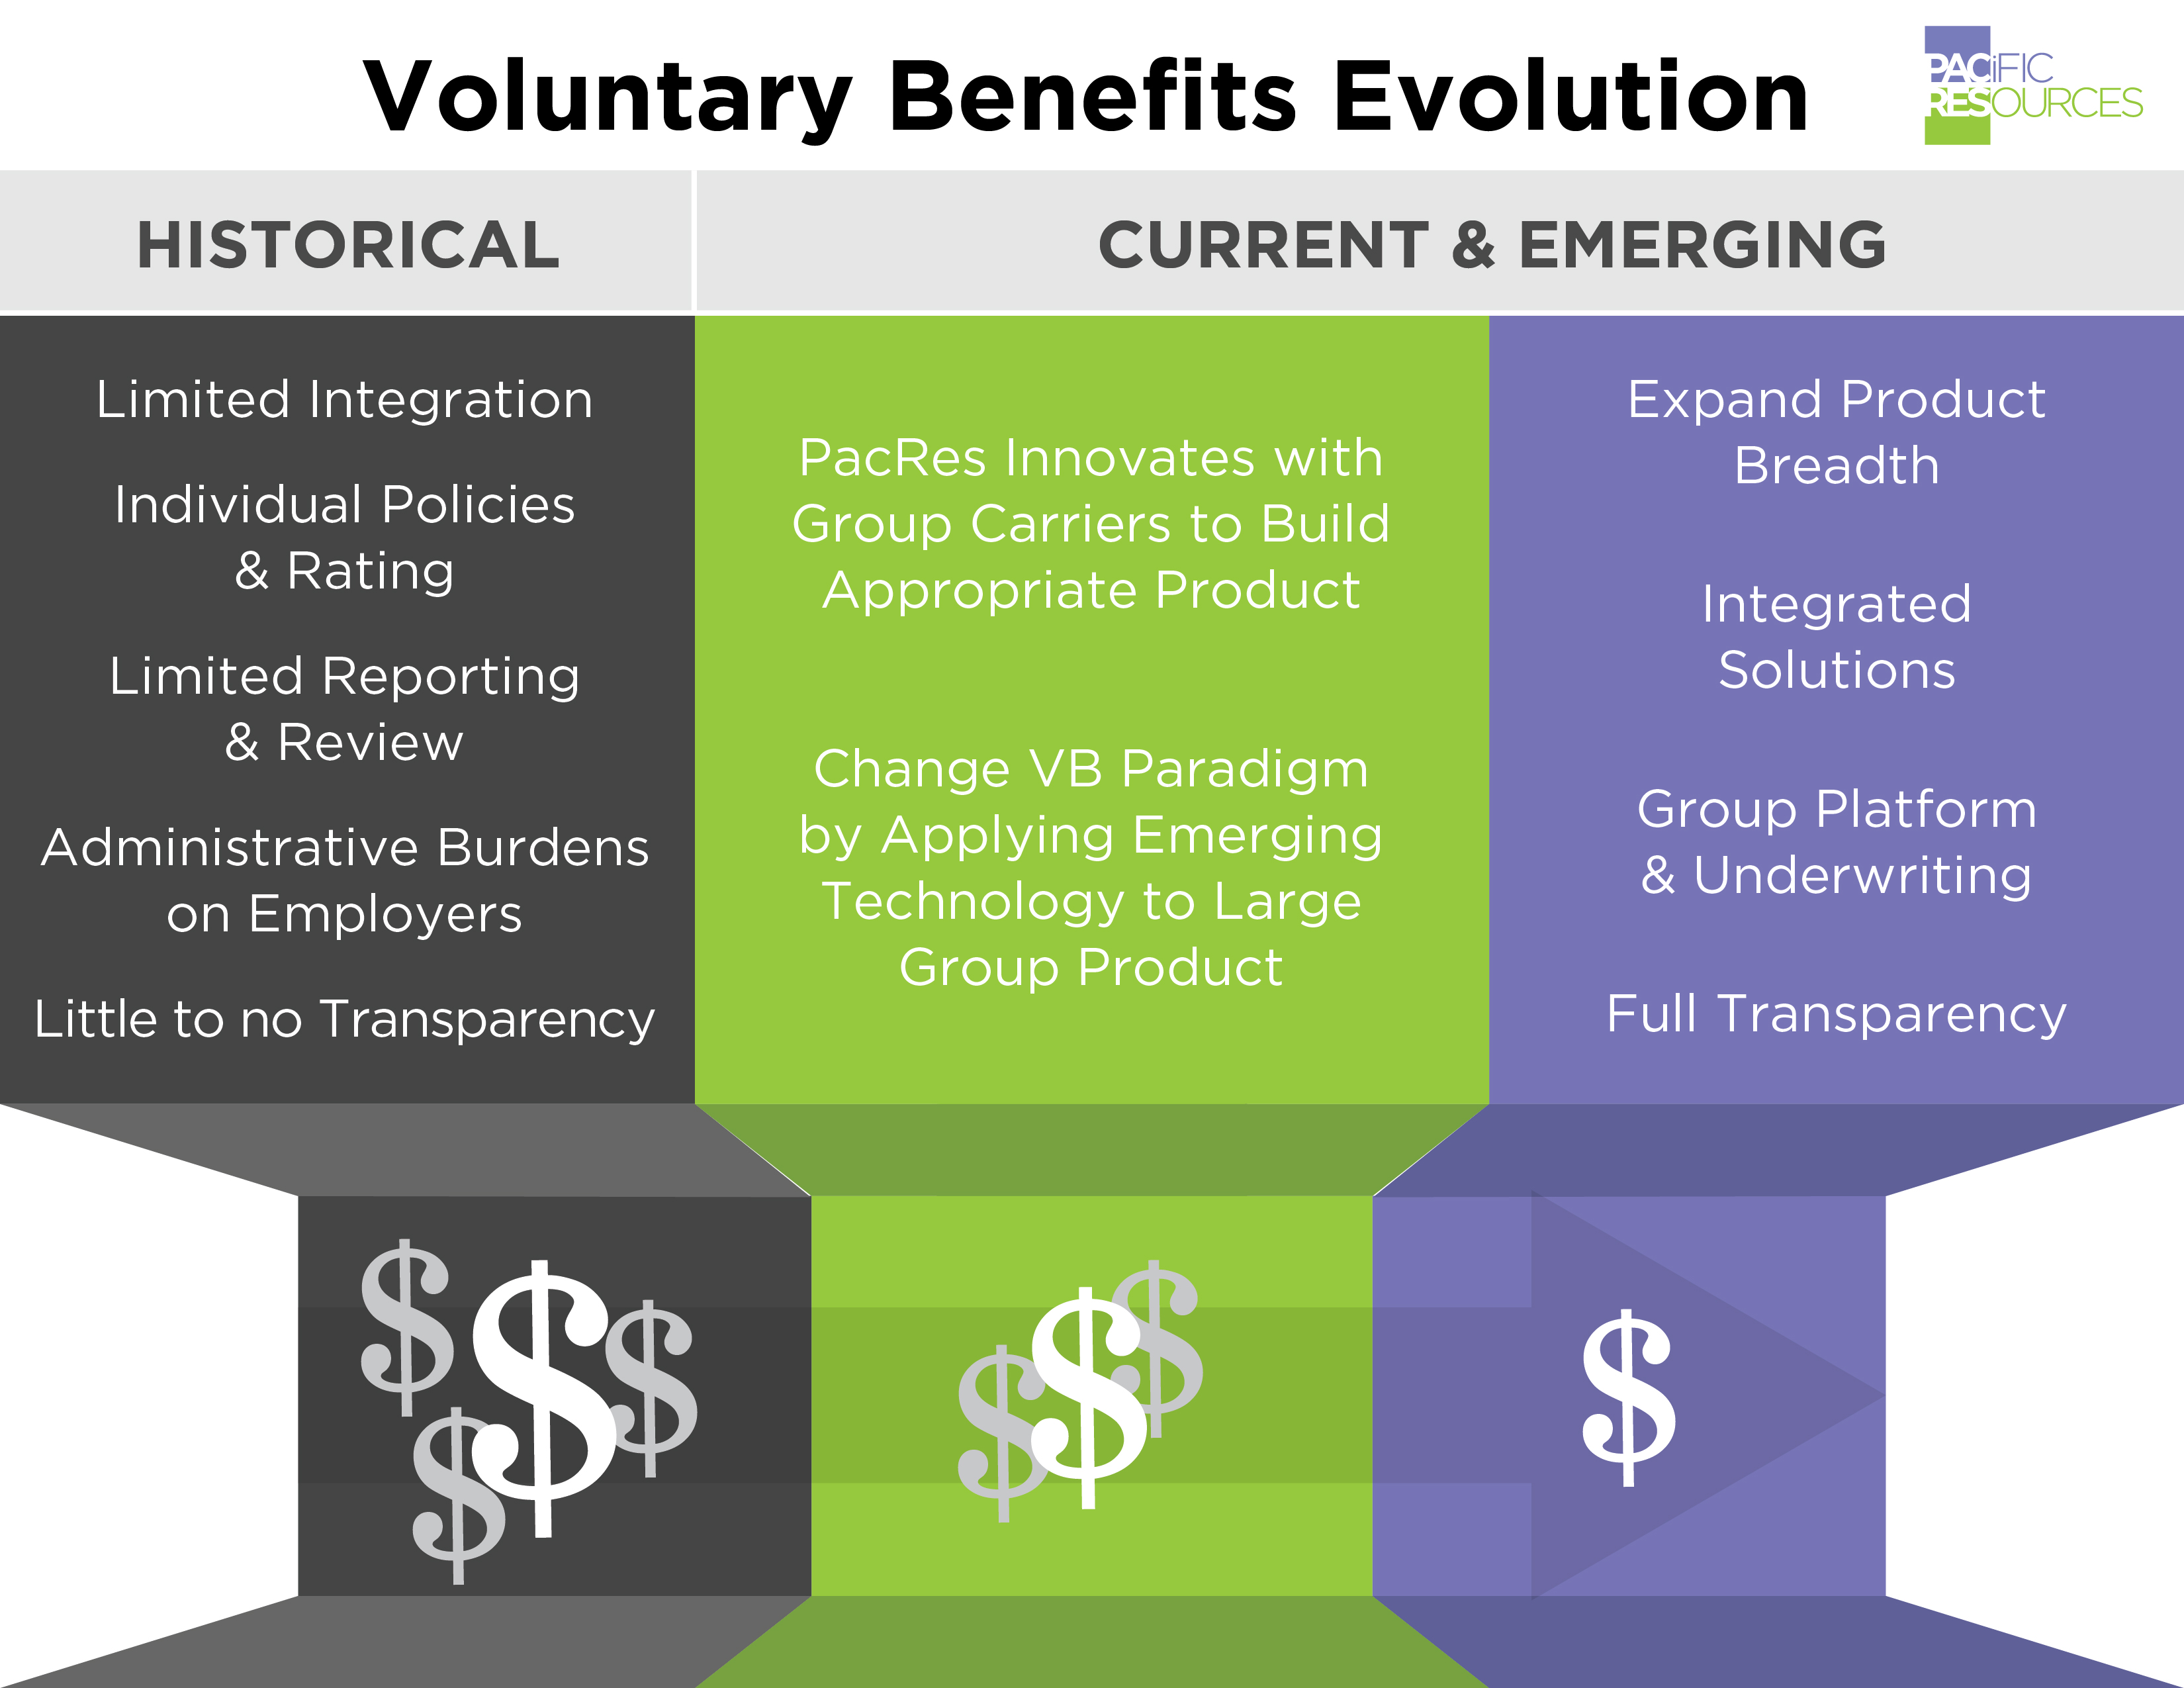 Evolution_of_Voluntary_Benefits